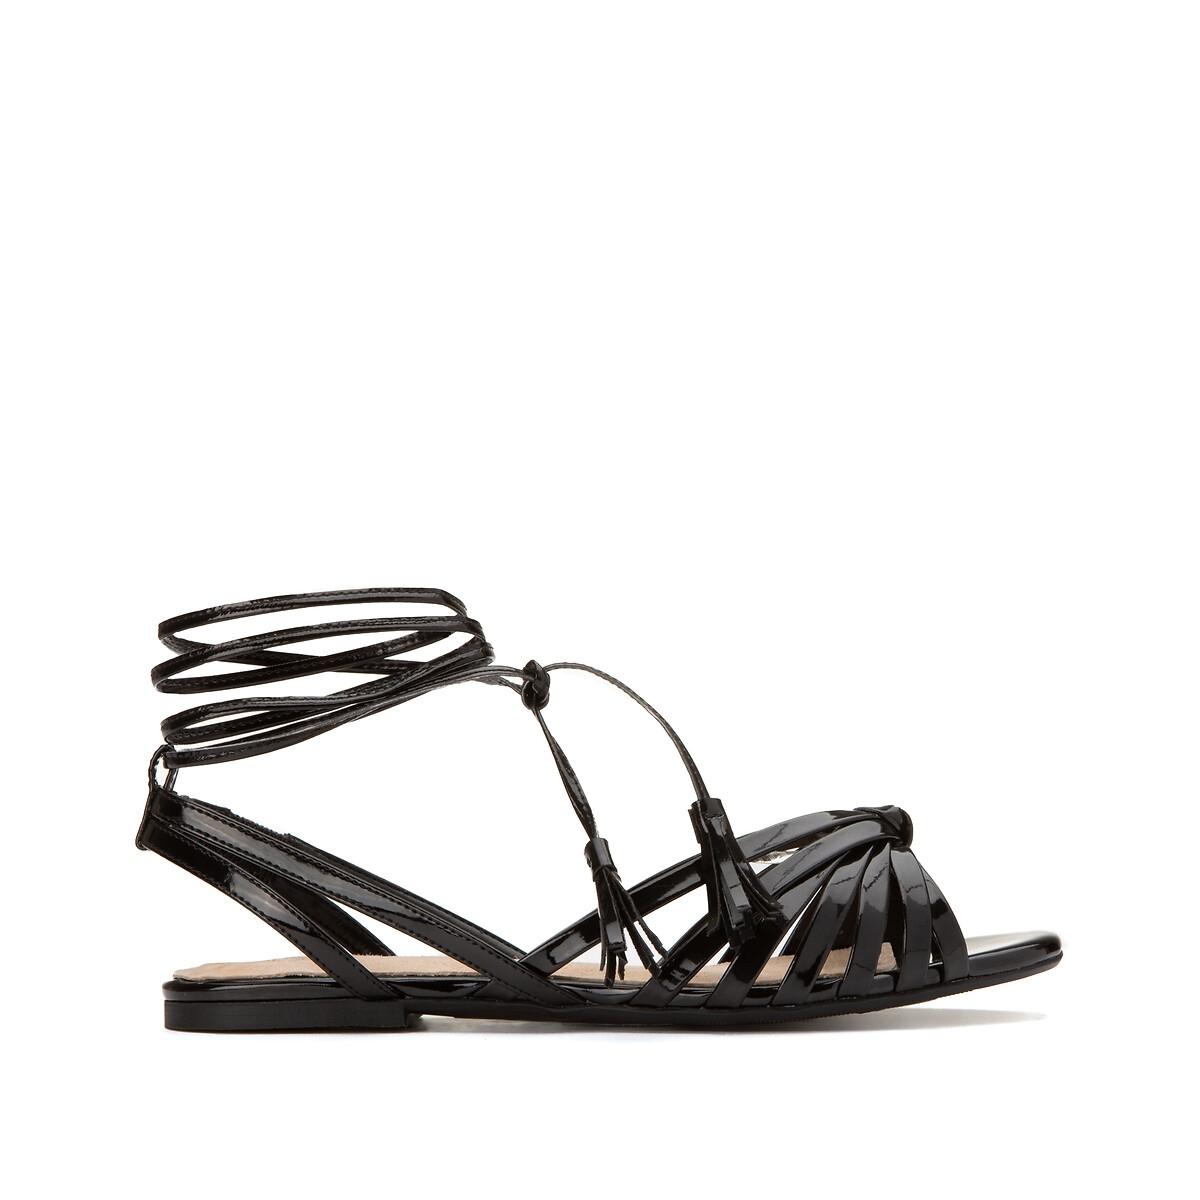 цена Босоножки La Redoute С ремешками на плоском каблуке 39 черный онлайн в 2017 году